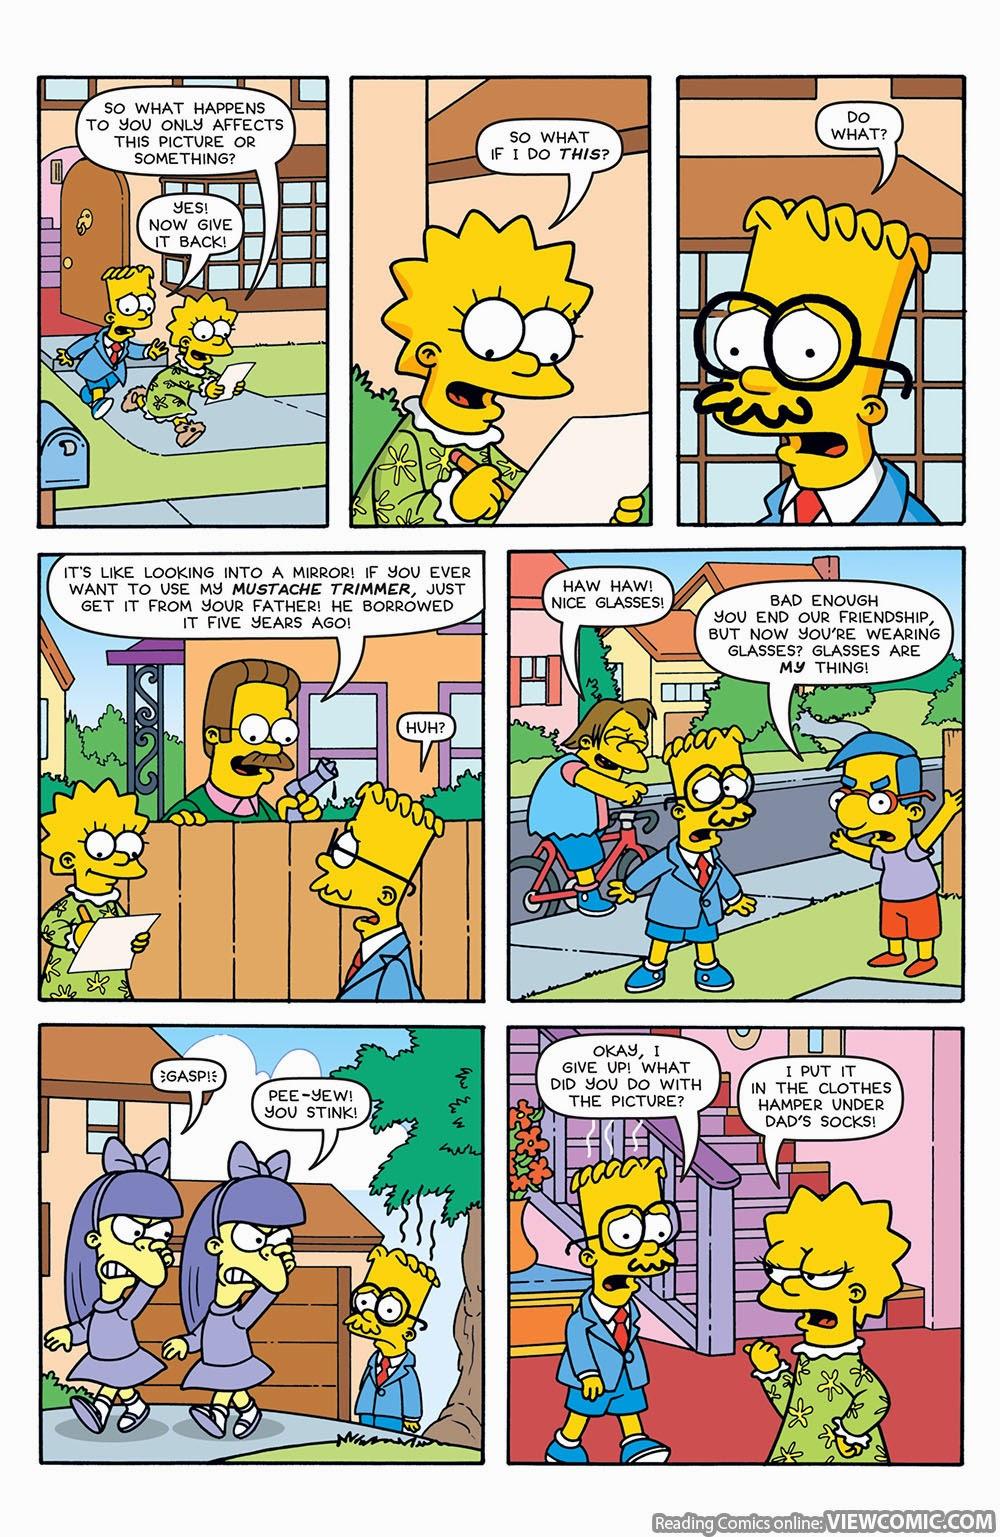 Simpsons Comics 196 (2012) ………………… … | Viewcomic reading